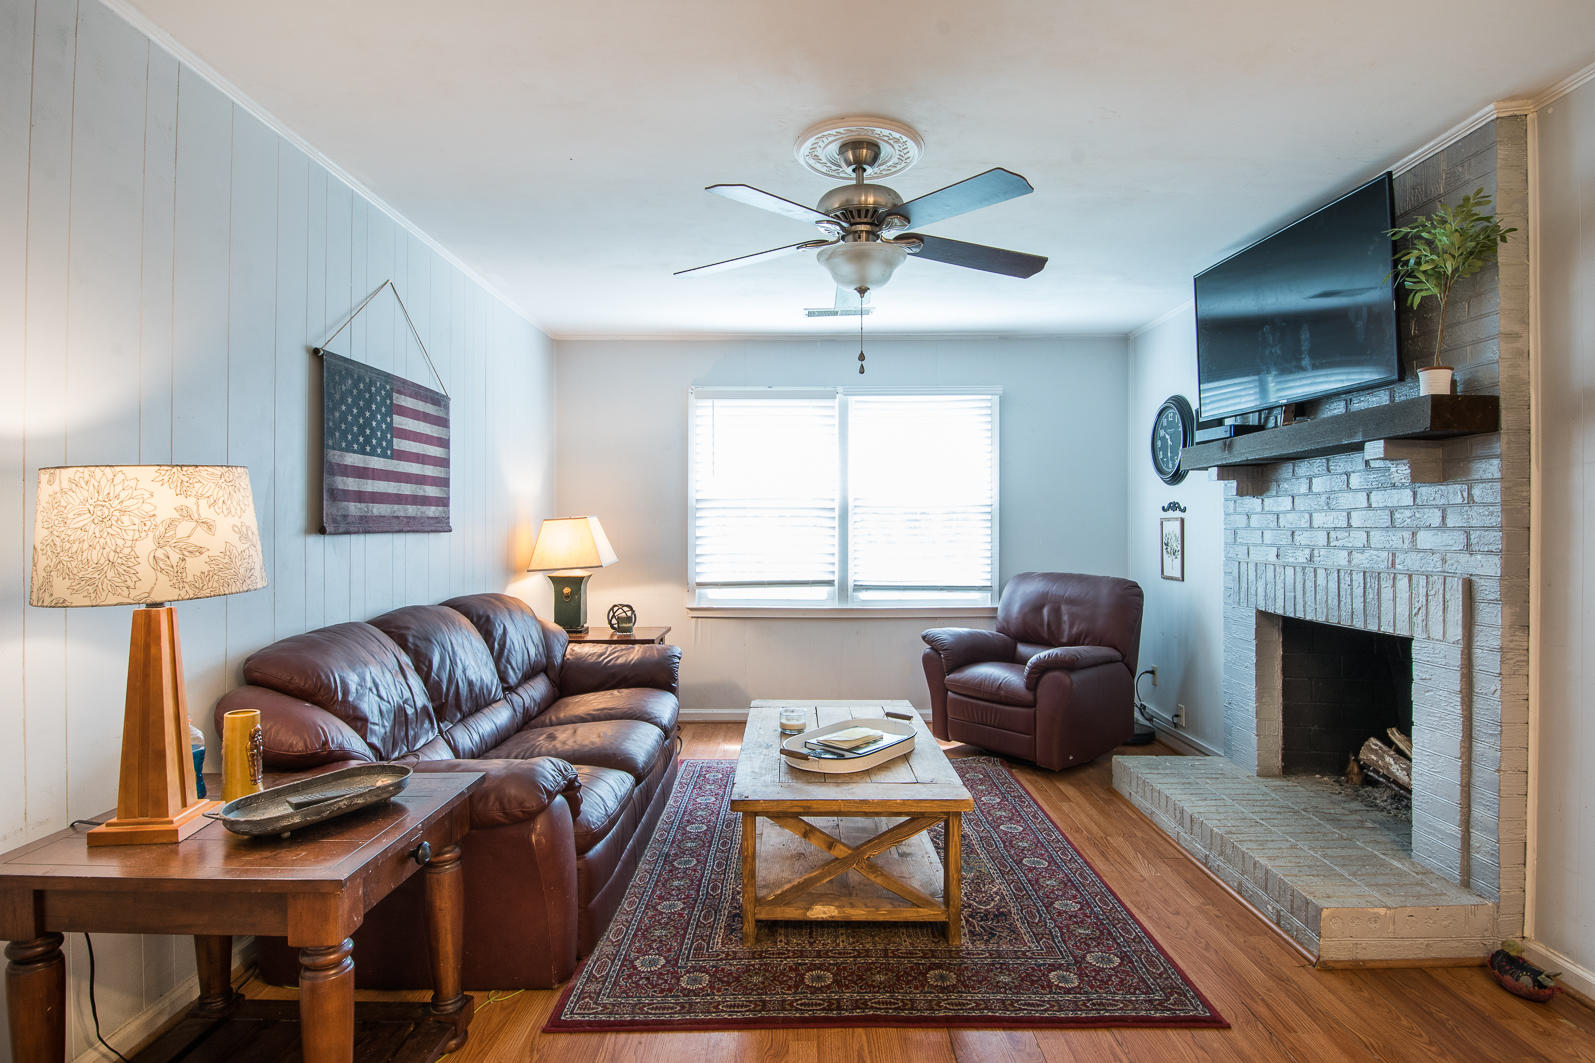 Wando East Homes For Sale - 1605 Babington, Mount Pleasant, SC - 29